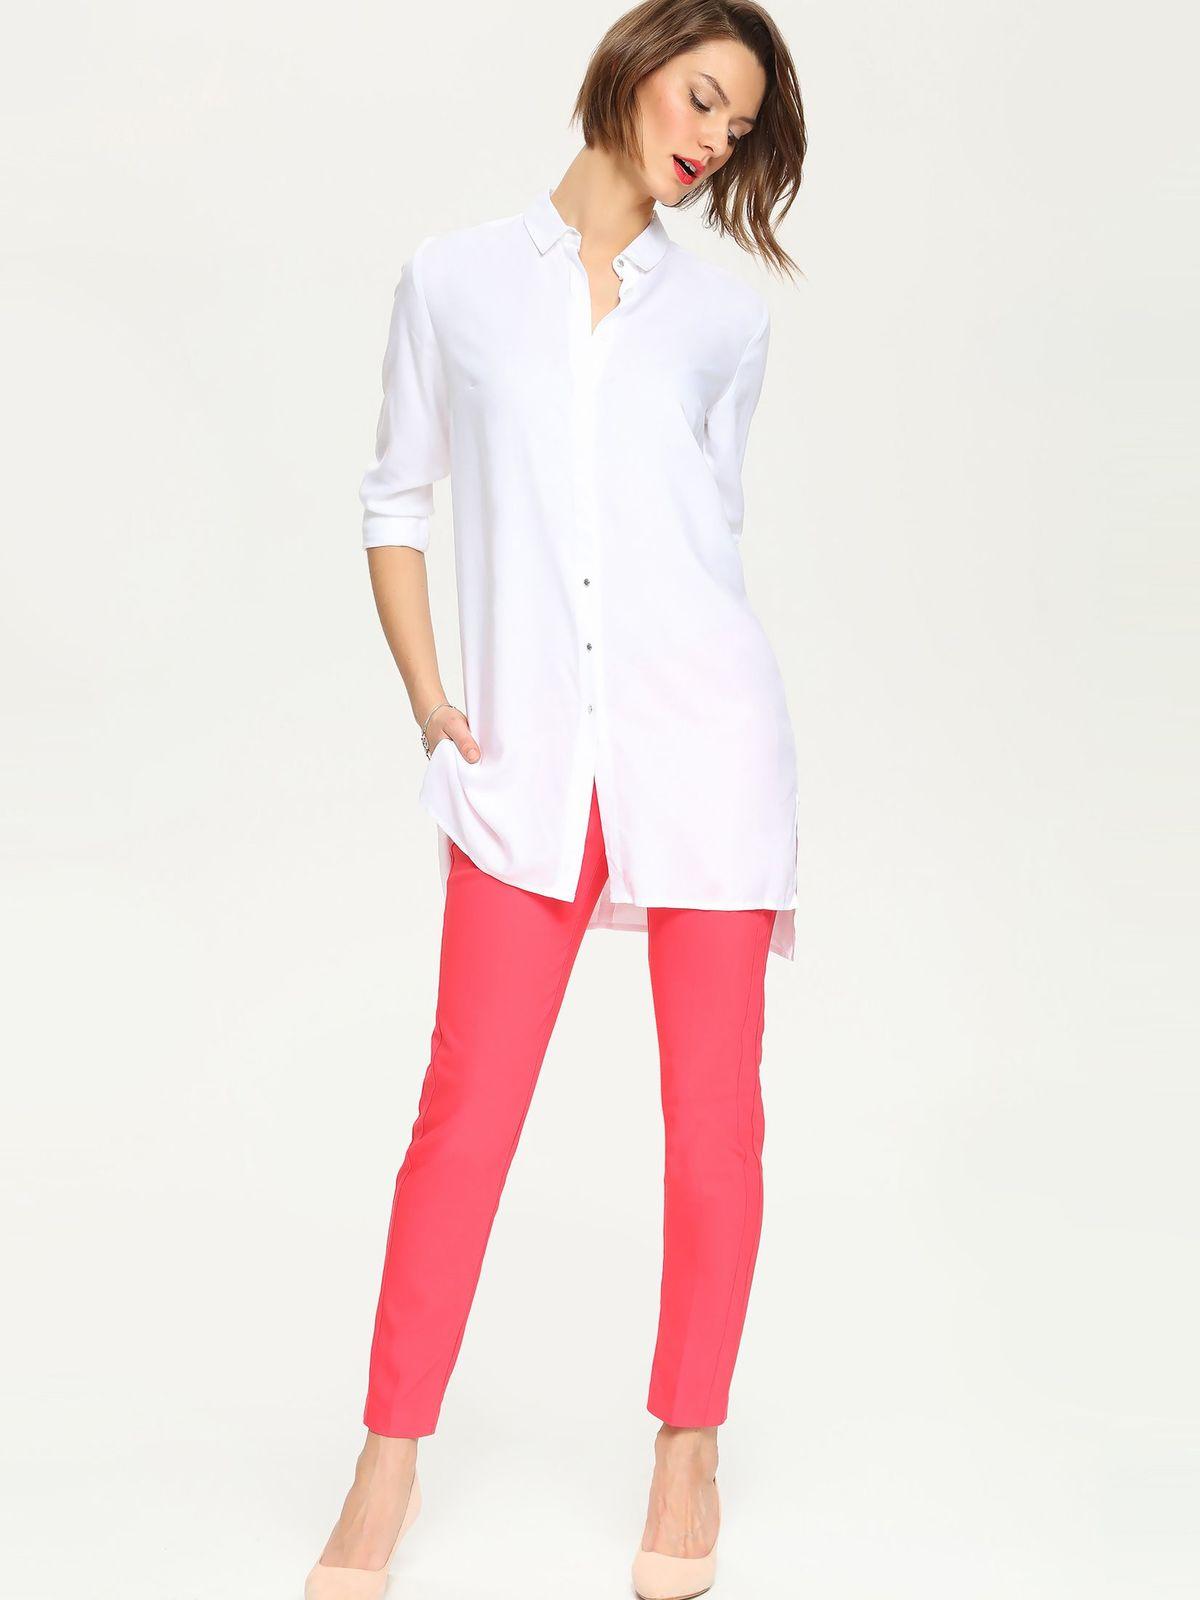 TOP SECRET γυναικειο μακρυ πουκαμισο